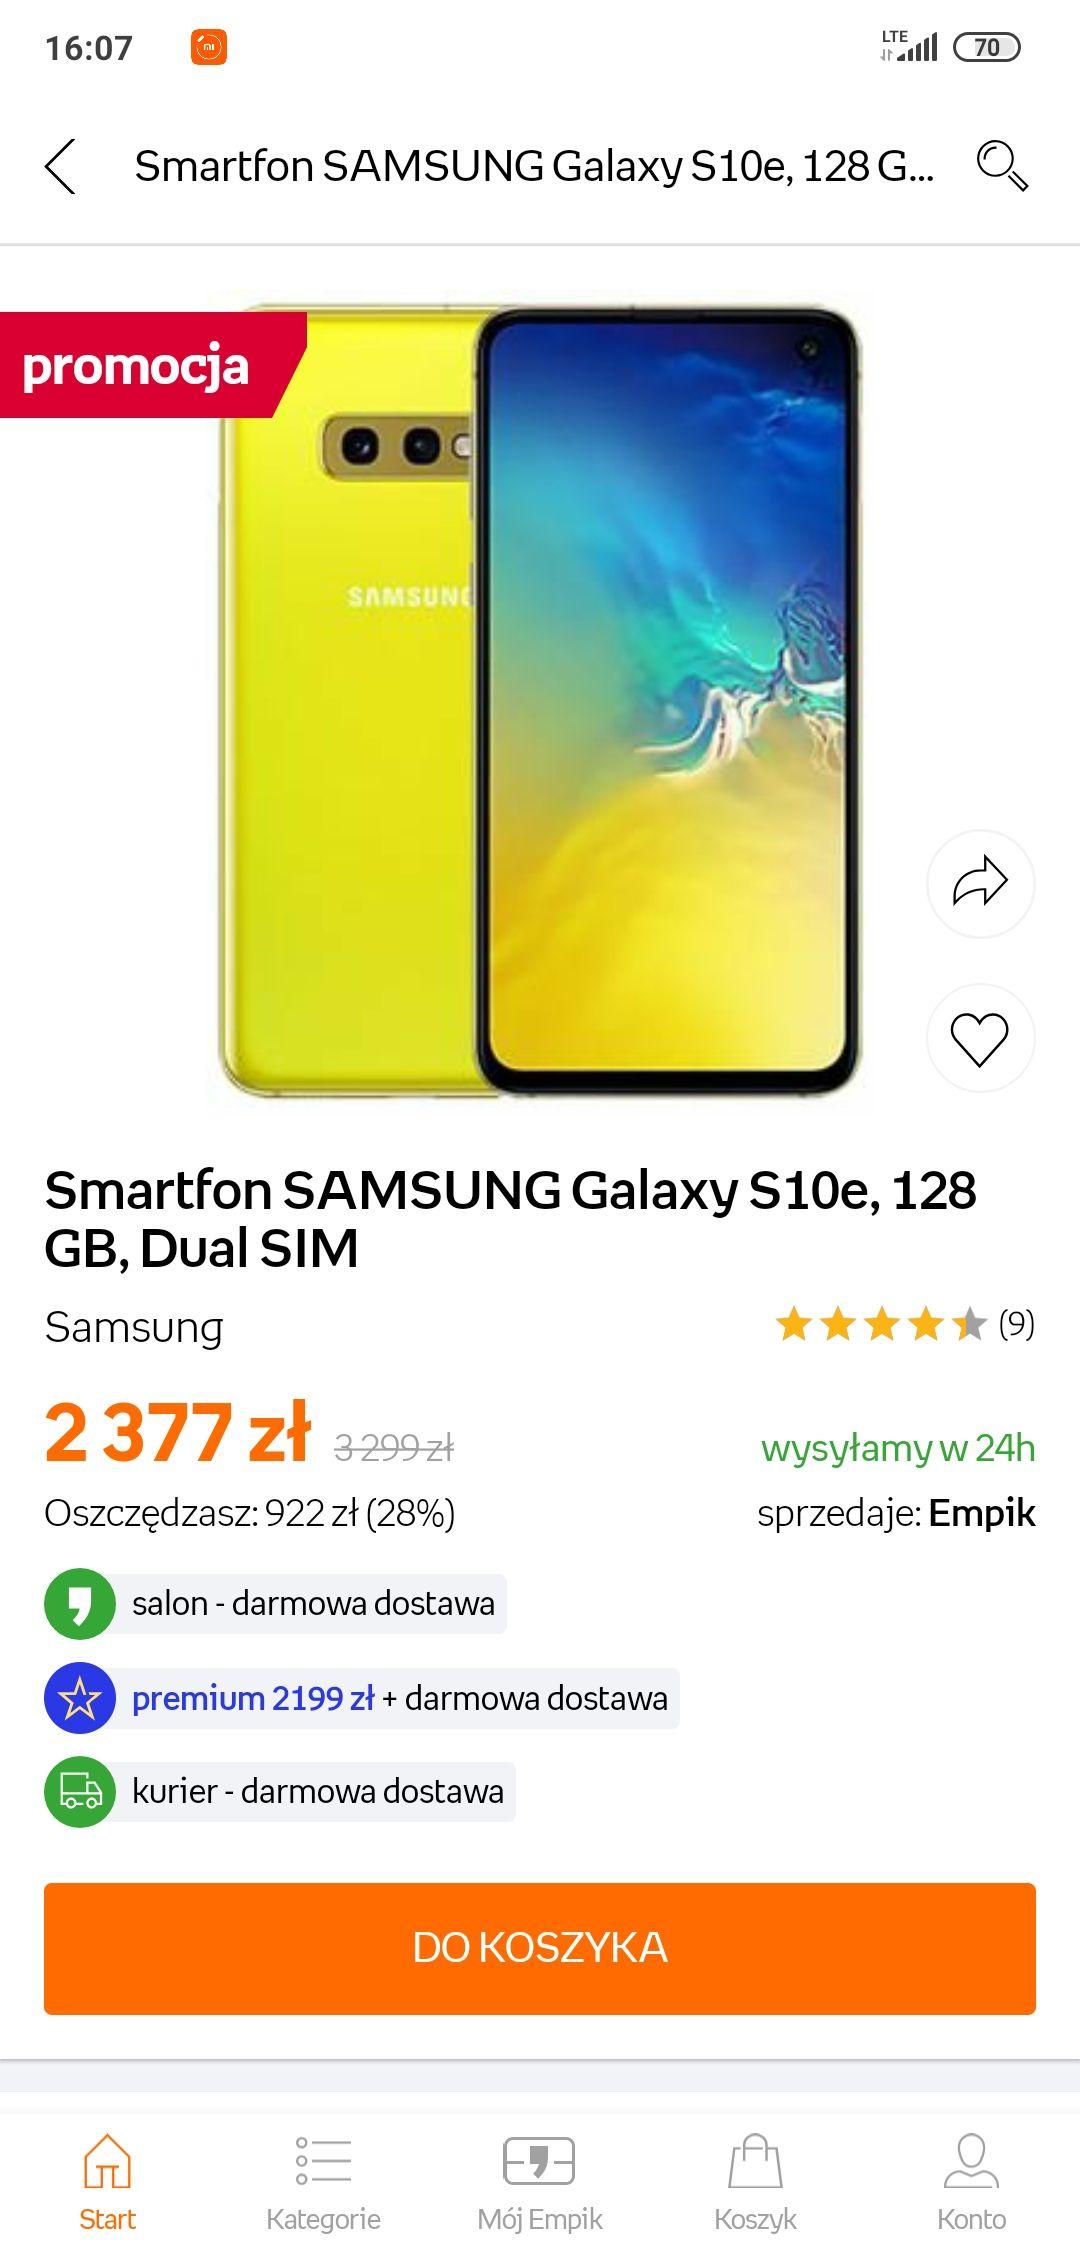 Samsung Galaxy s10e 128GB Empik ( 2199zł z premium)